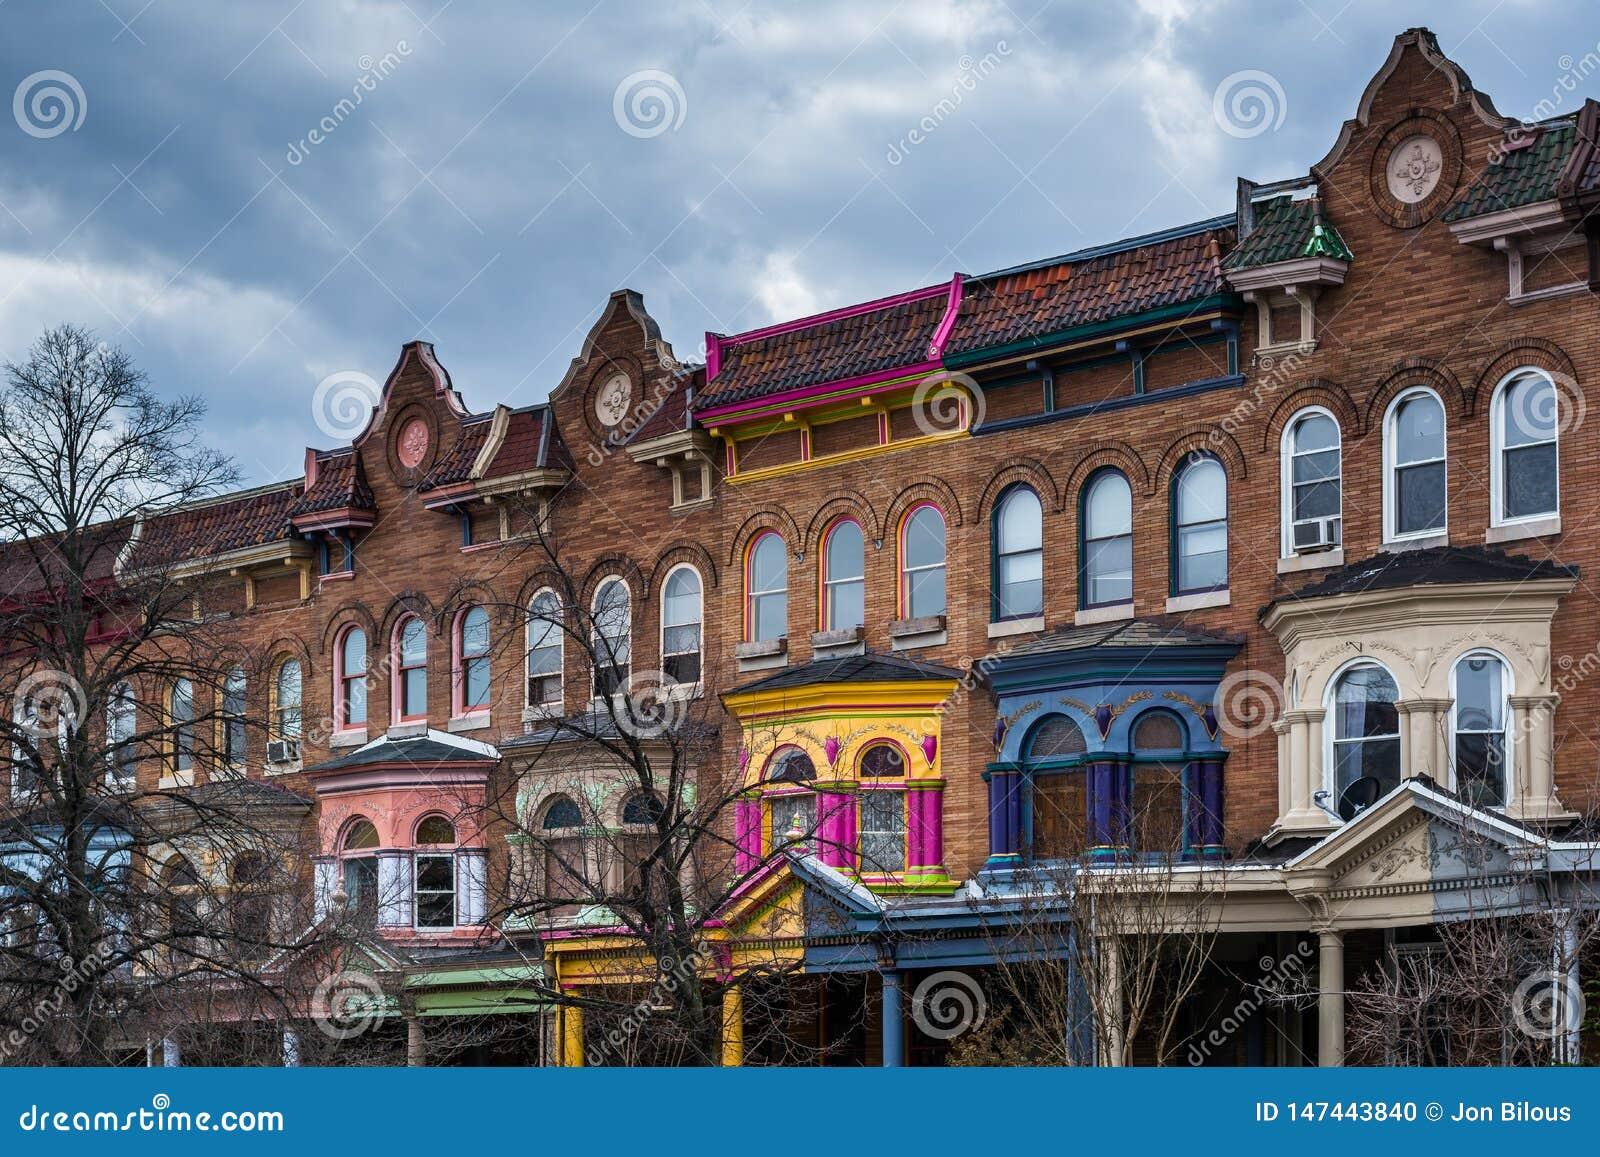 Row houses on Calvert Street in Charles Village, Baltimore, Maryland